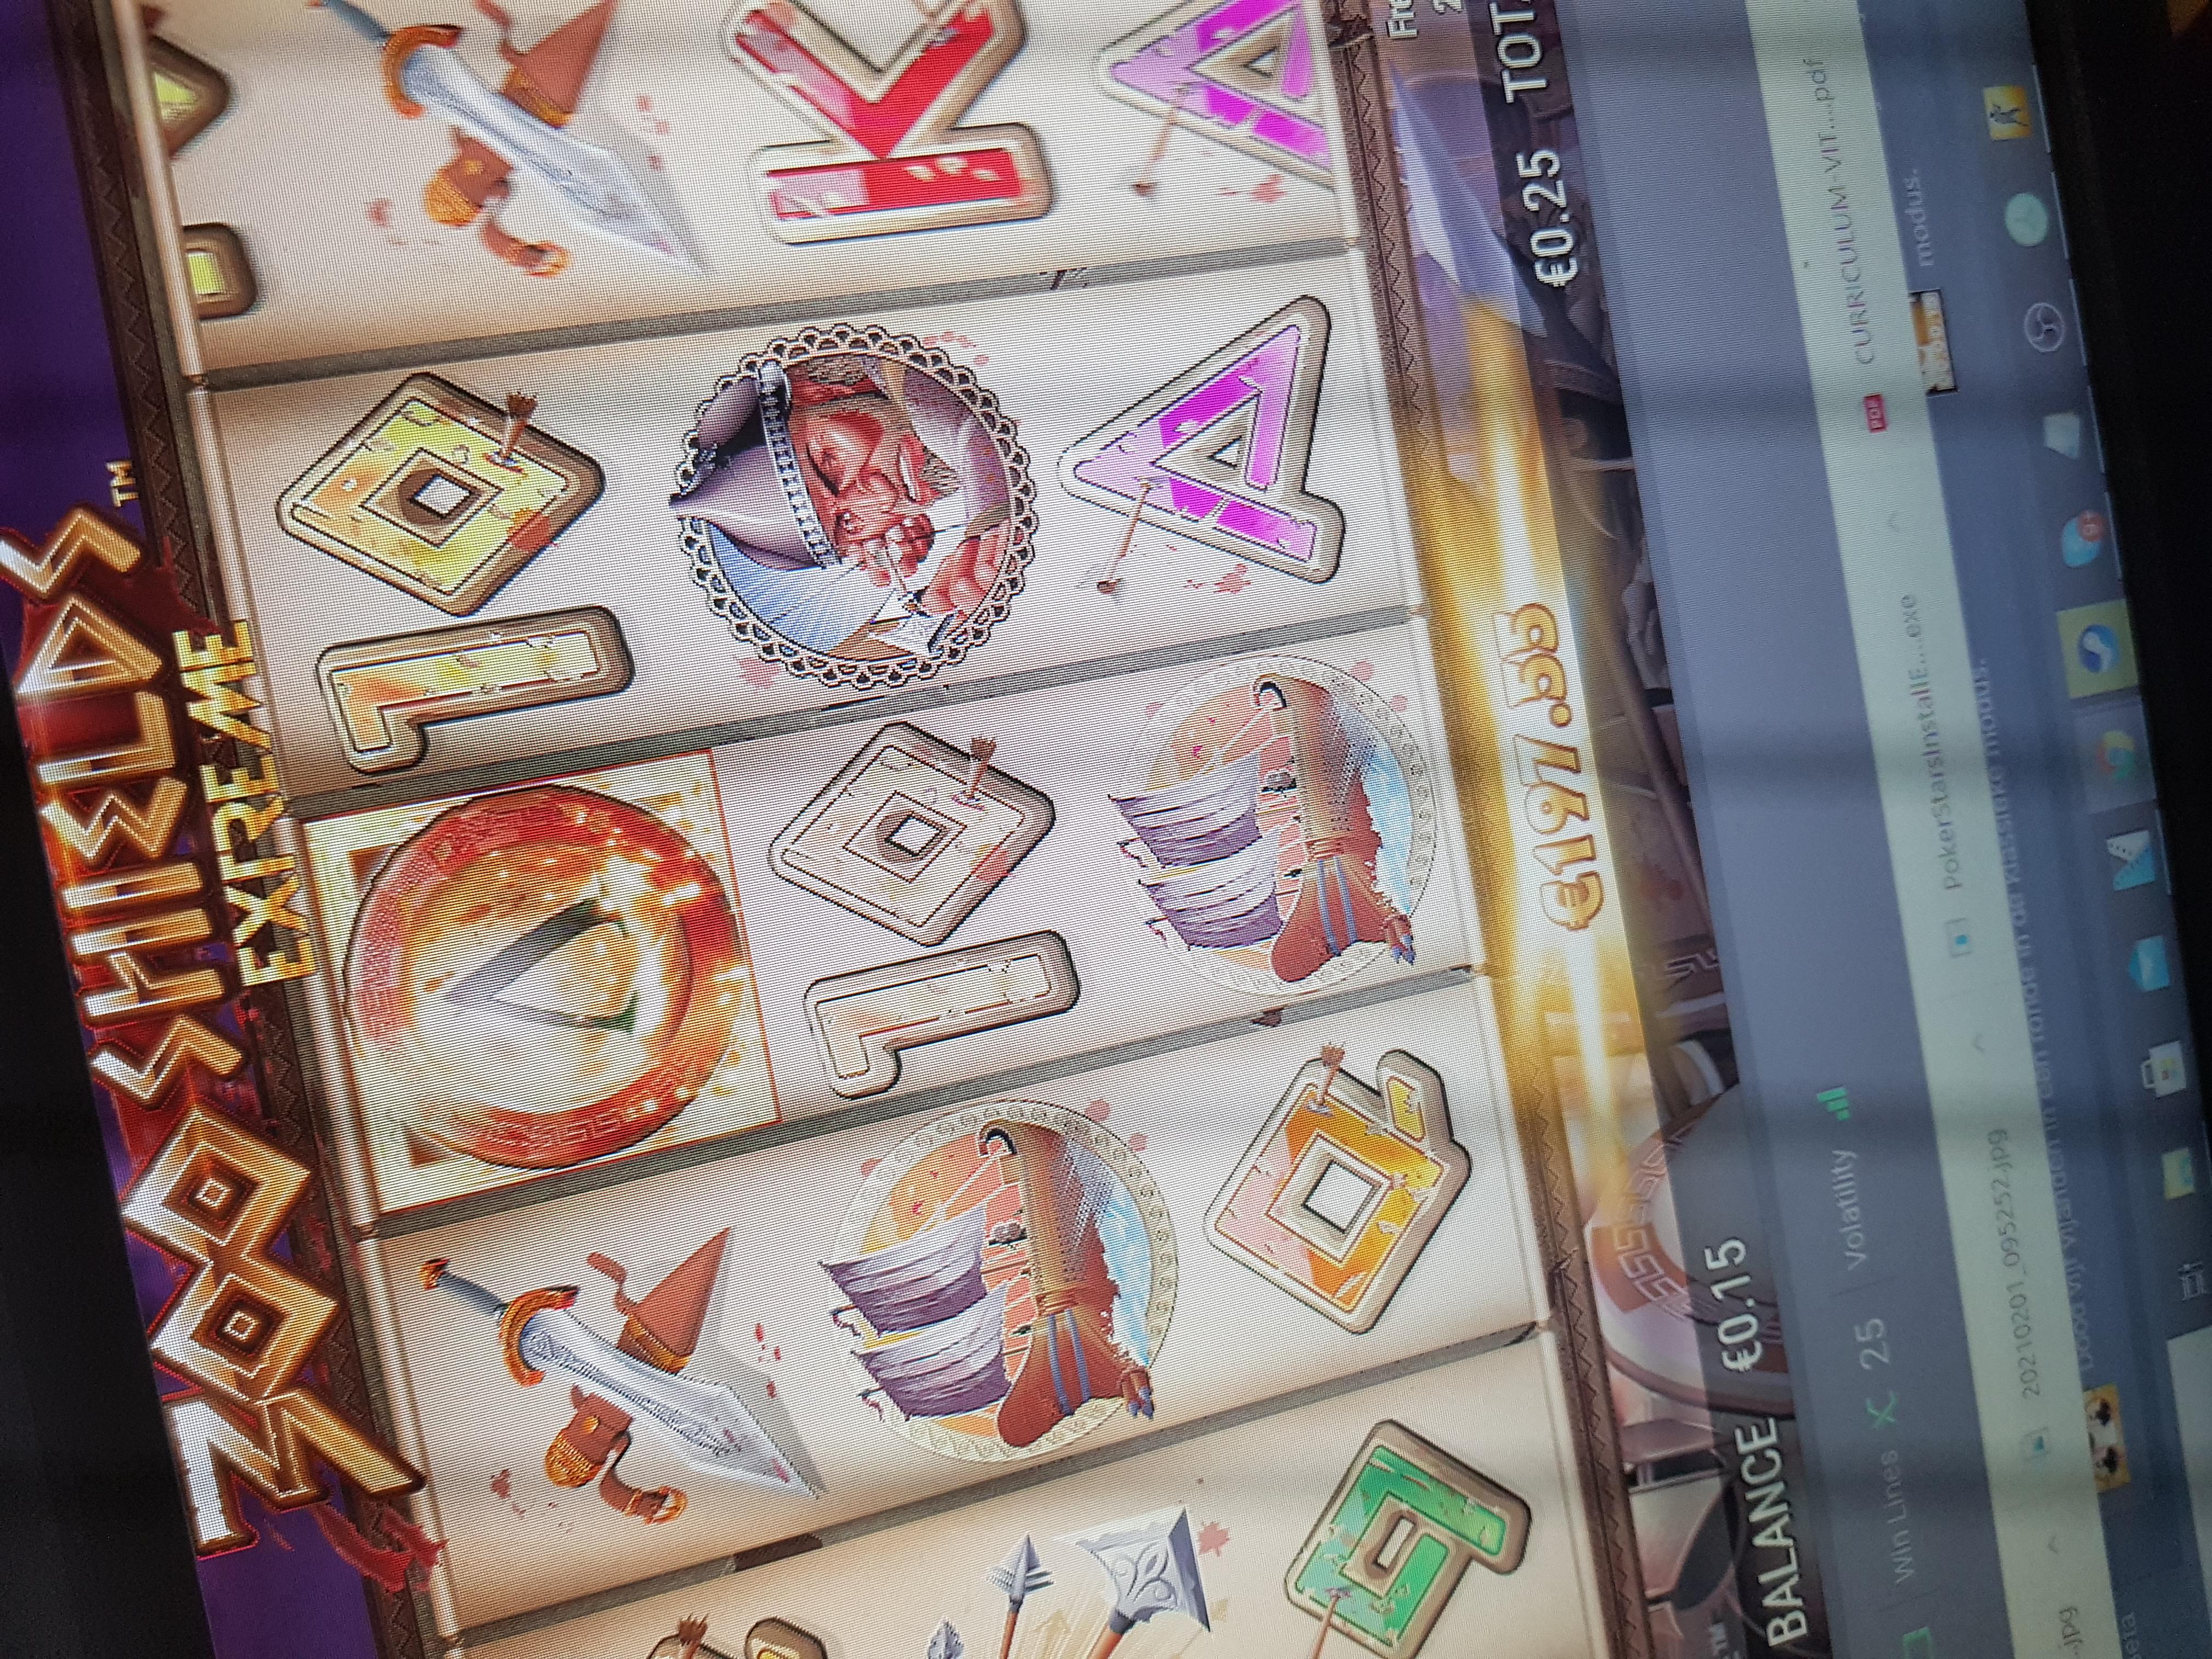 300 shield extreme 15 euro bonus buy 200eu hit unibet